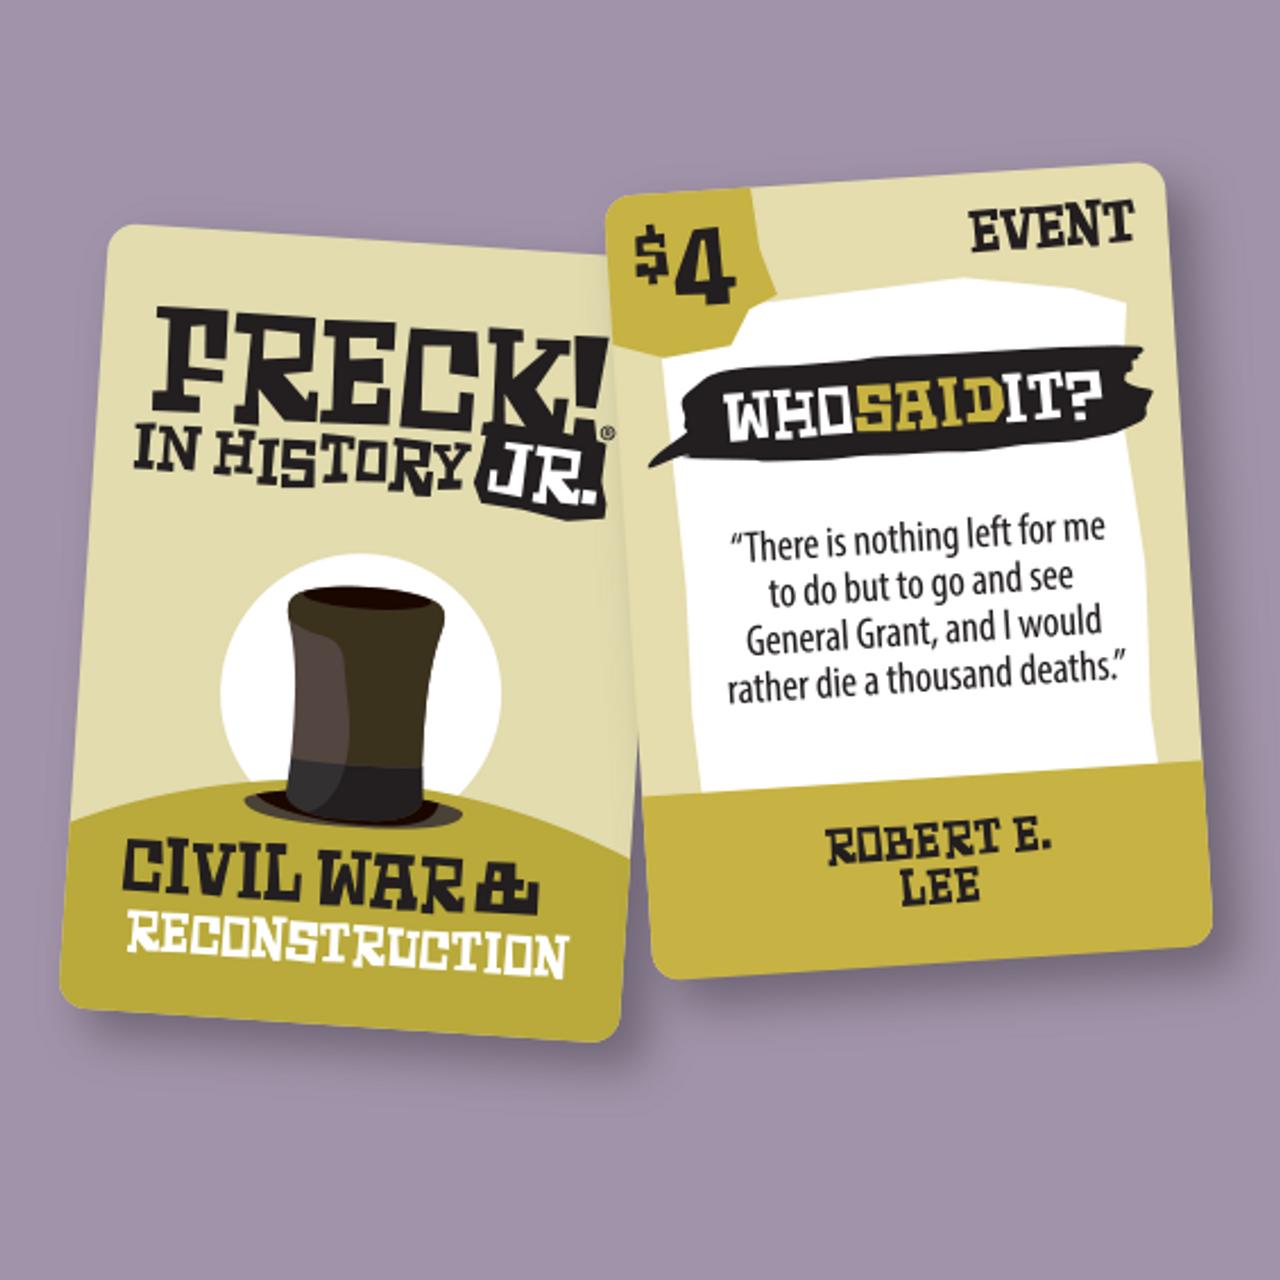 FRECK! in History JR. | 380 cards | Intermediate | Explorers to Modern America